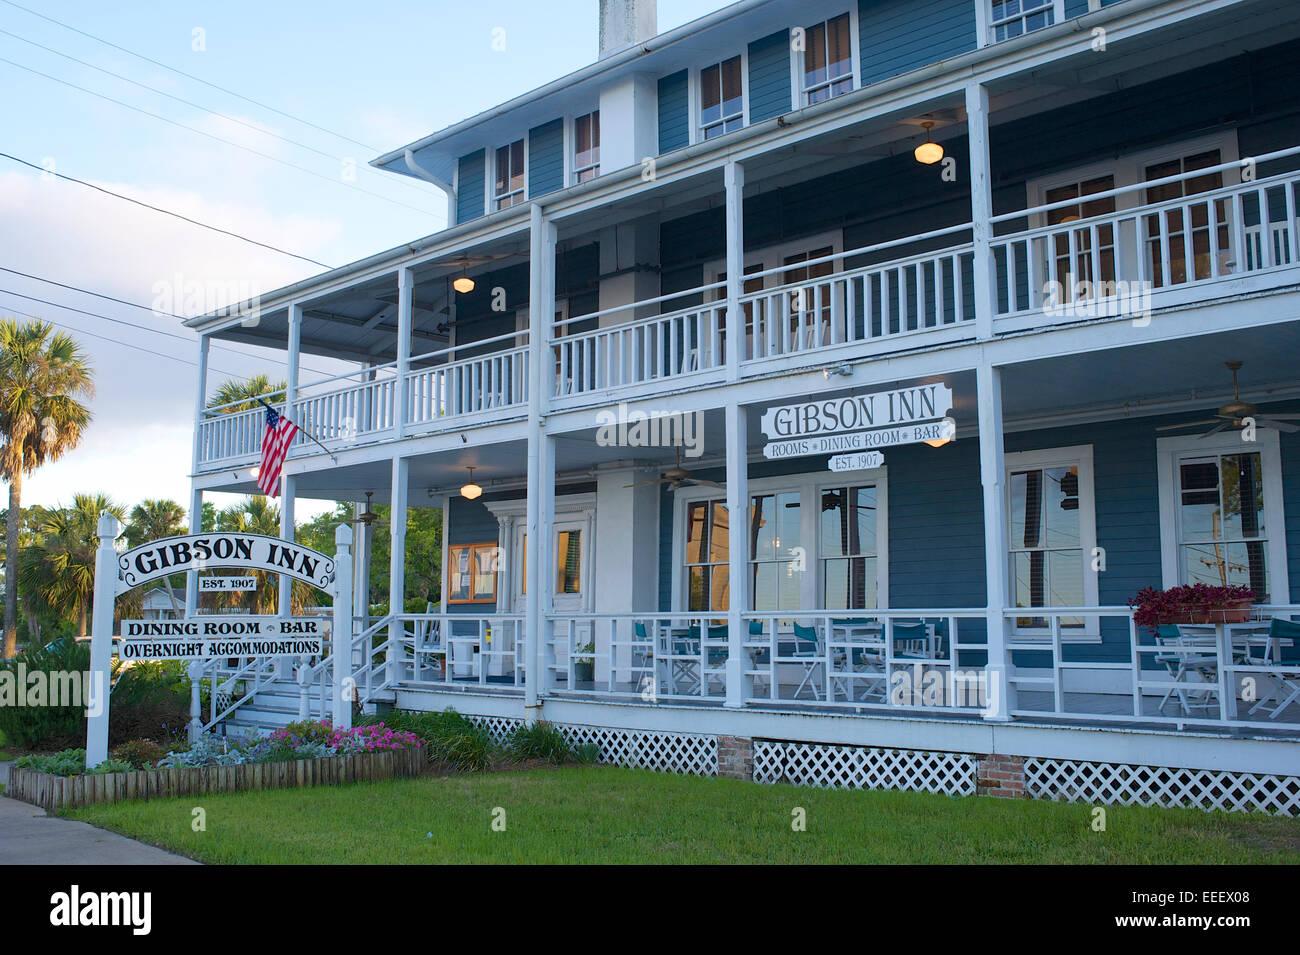 Gibson Inn, Apalachicola, Florida - Stock Image